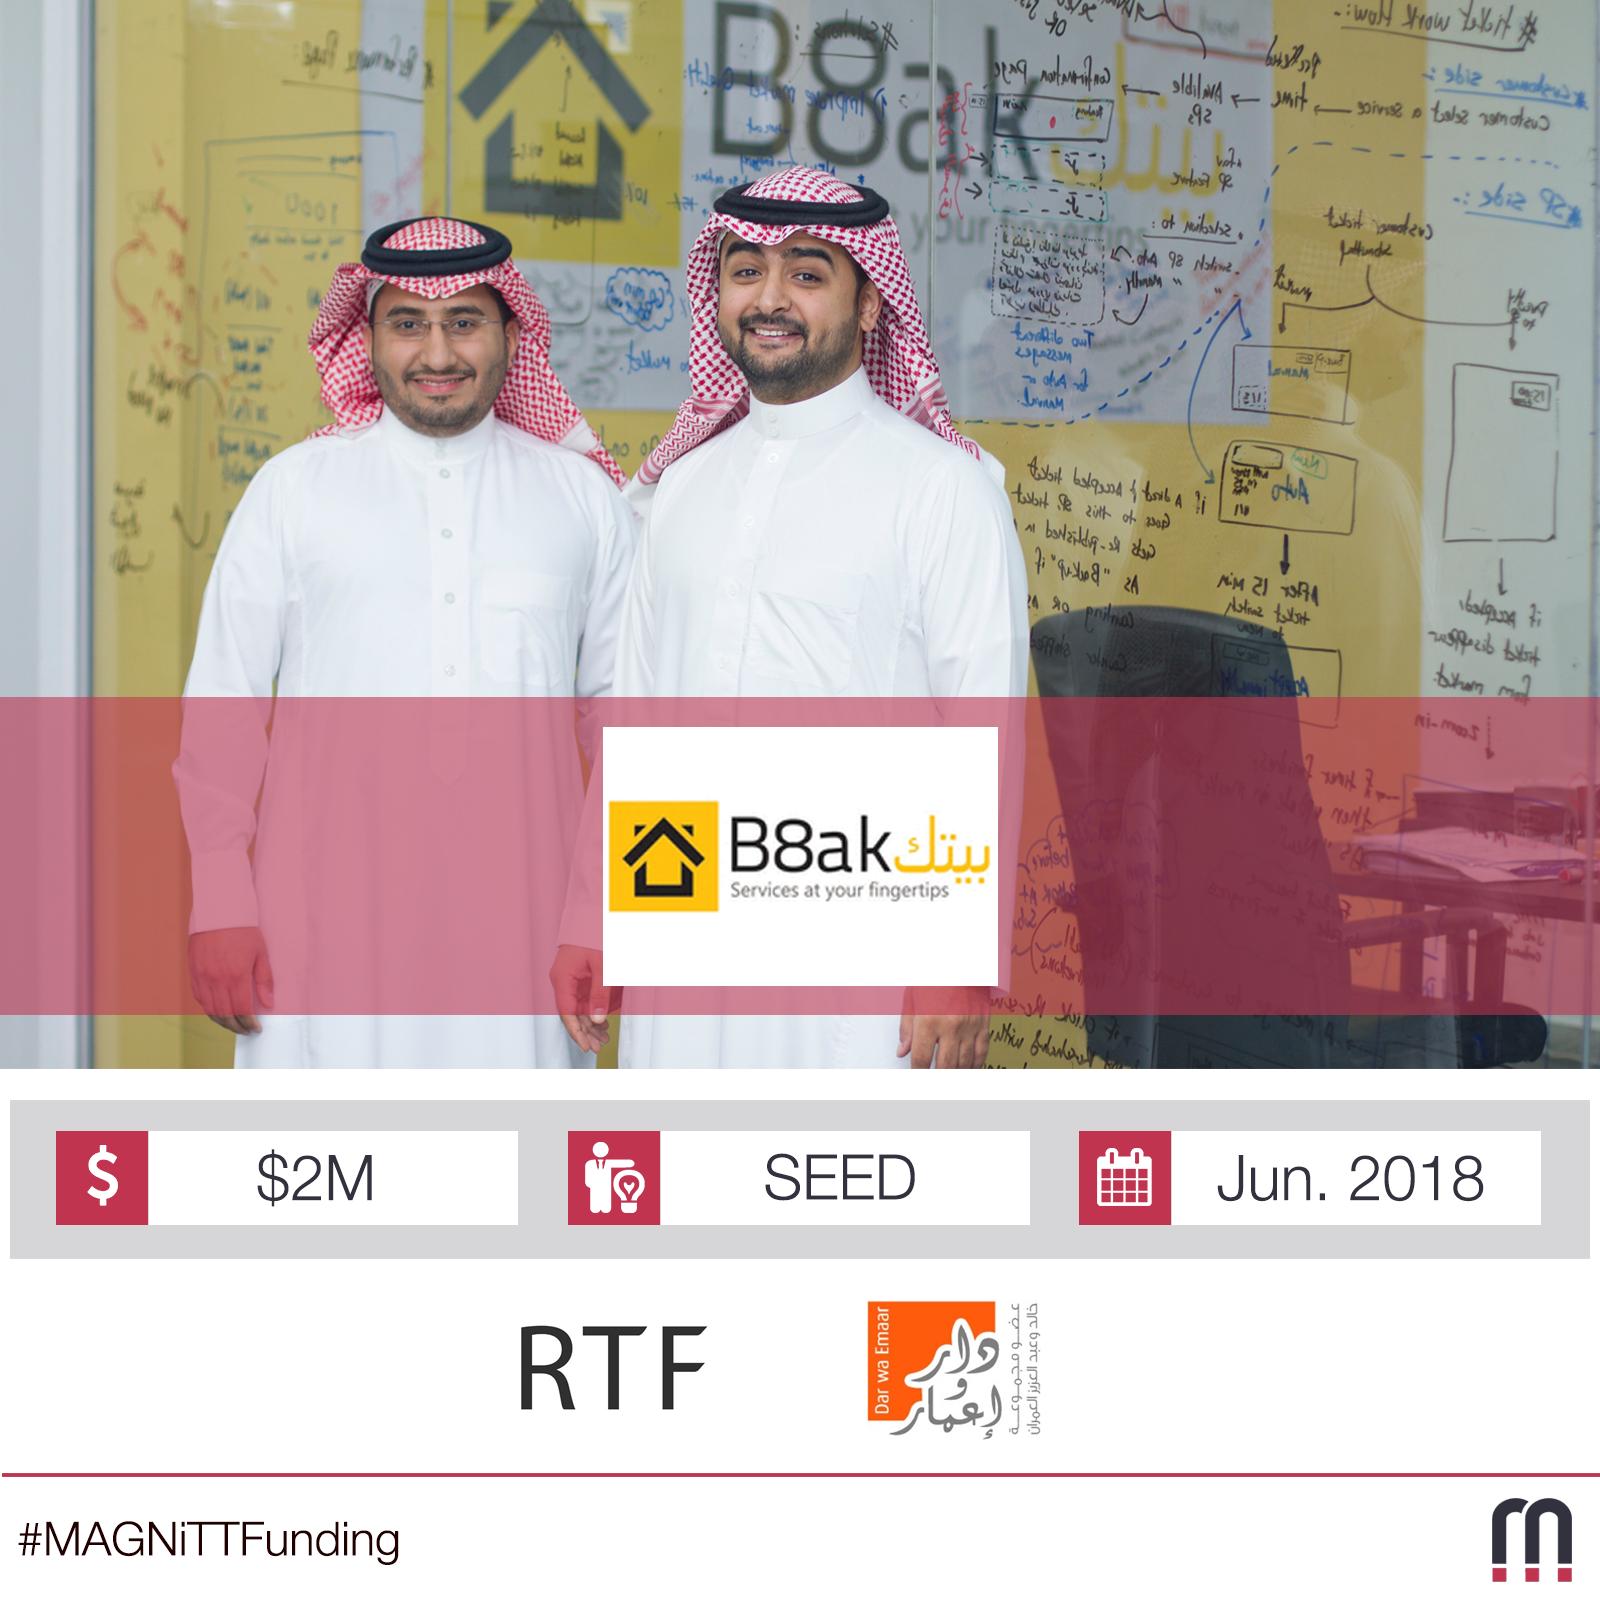 B8ak closes a SEED round of $2M led by Riyad TAQNIA Fund